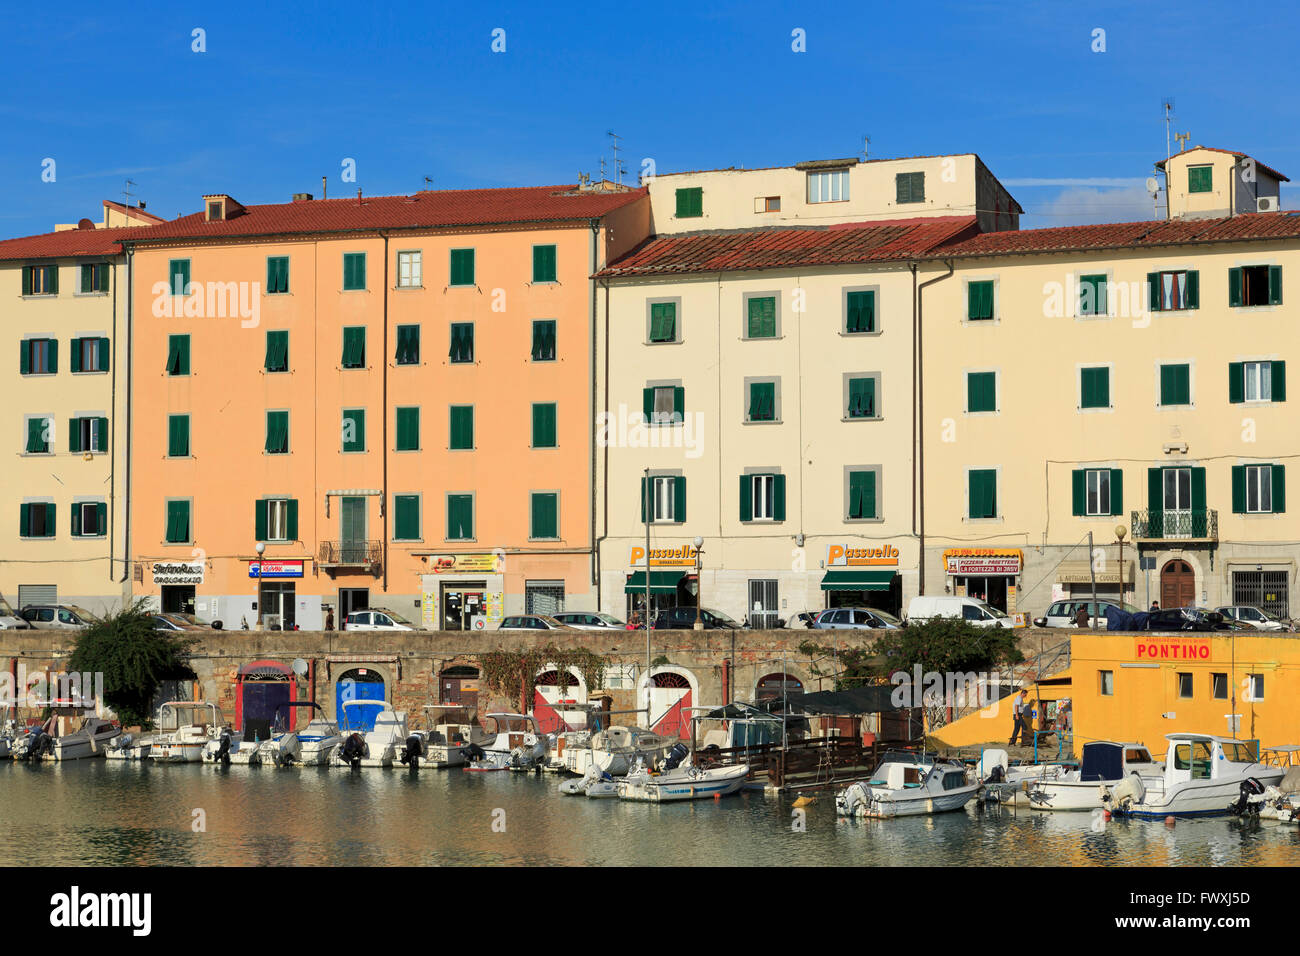 Venice Quarter, Livorno, Tuscany, Italy, Europe - Stock Image